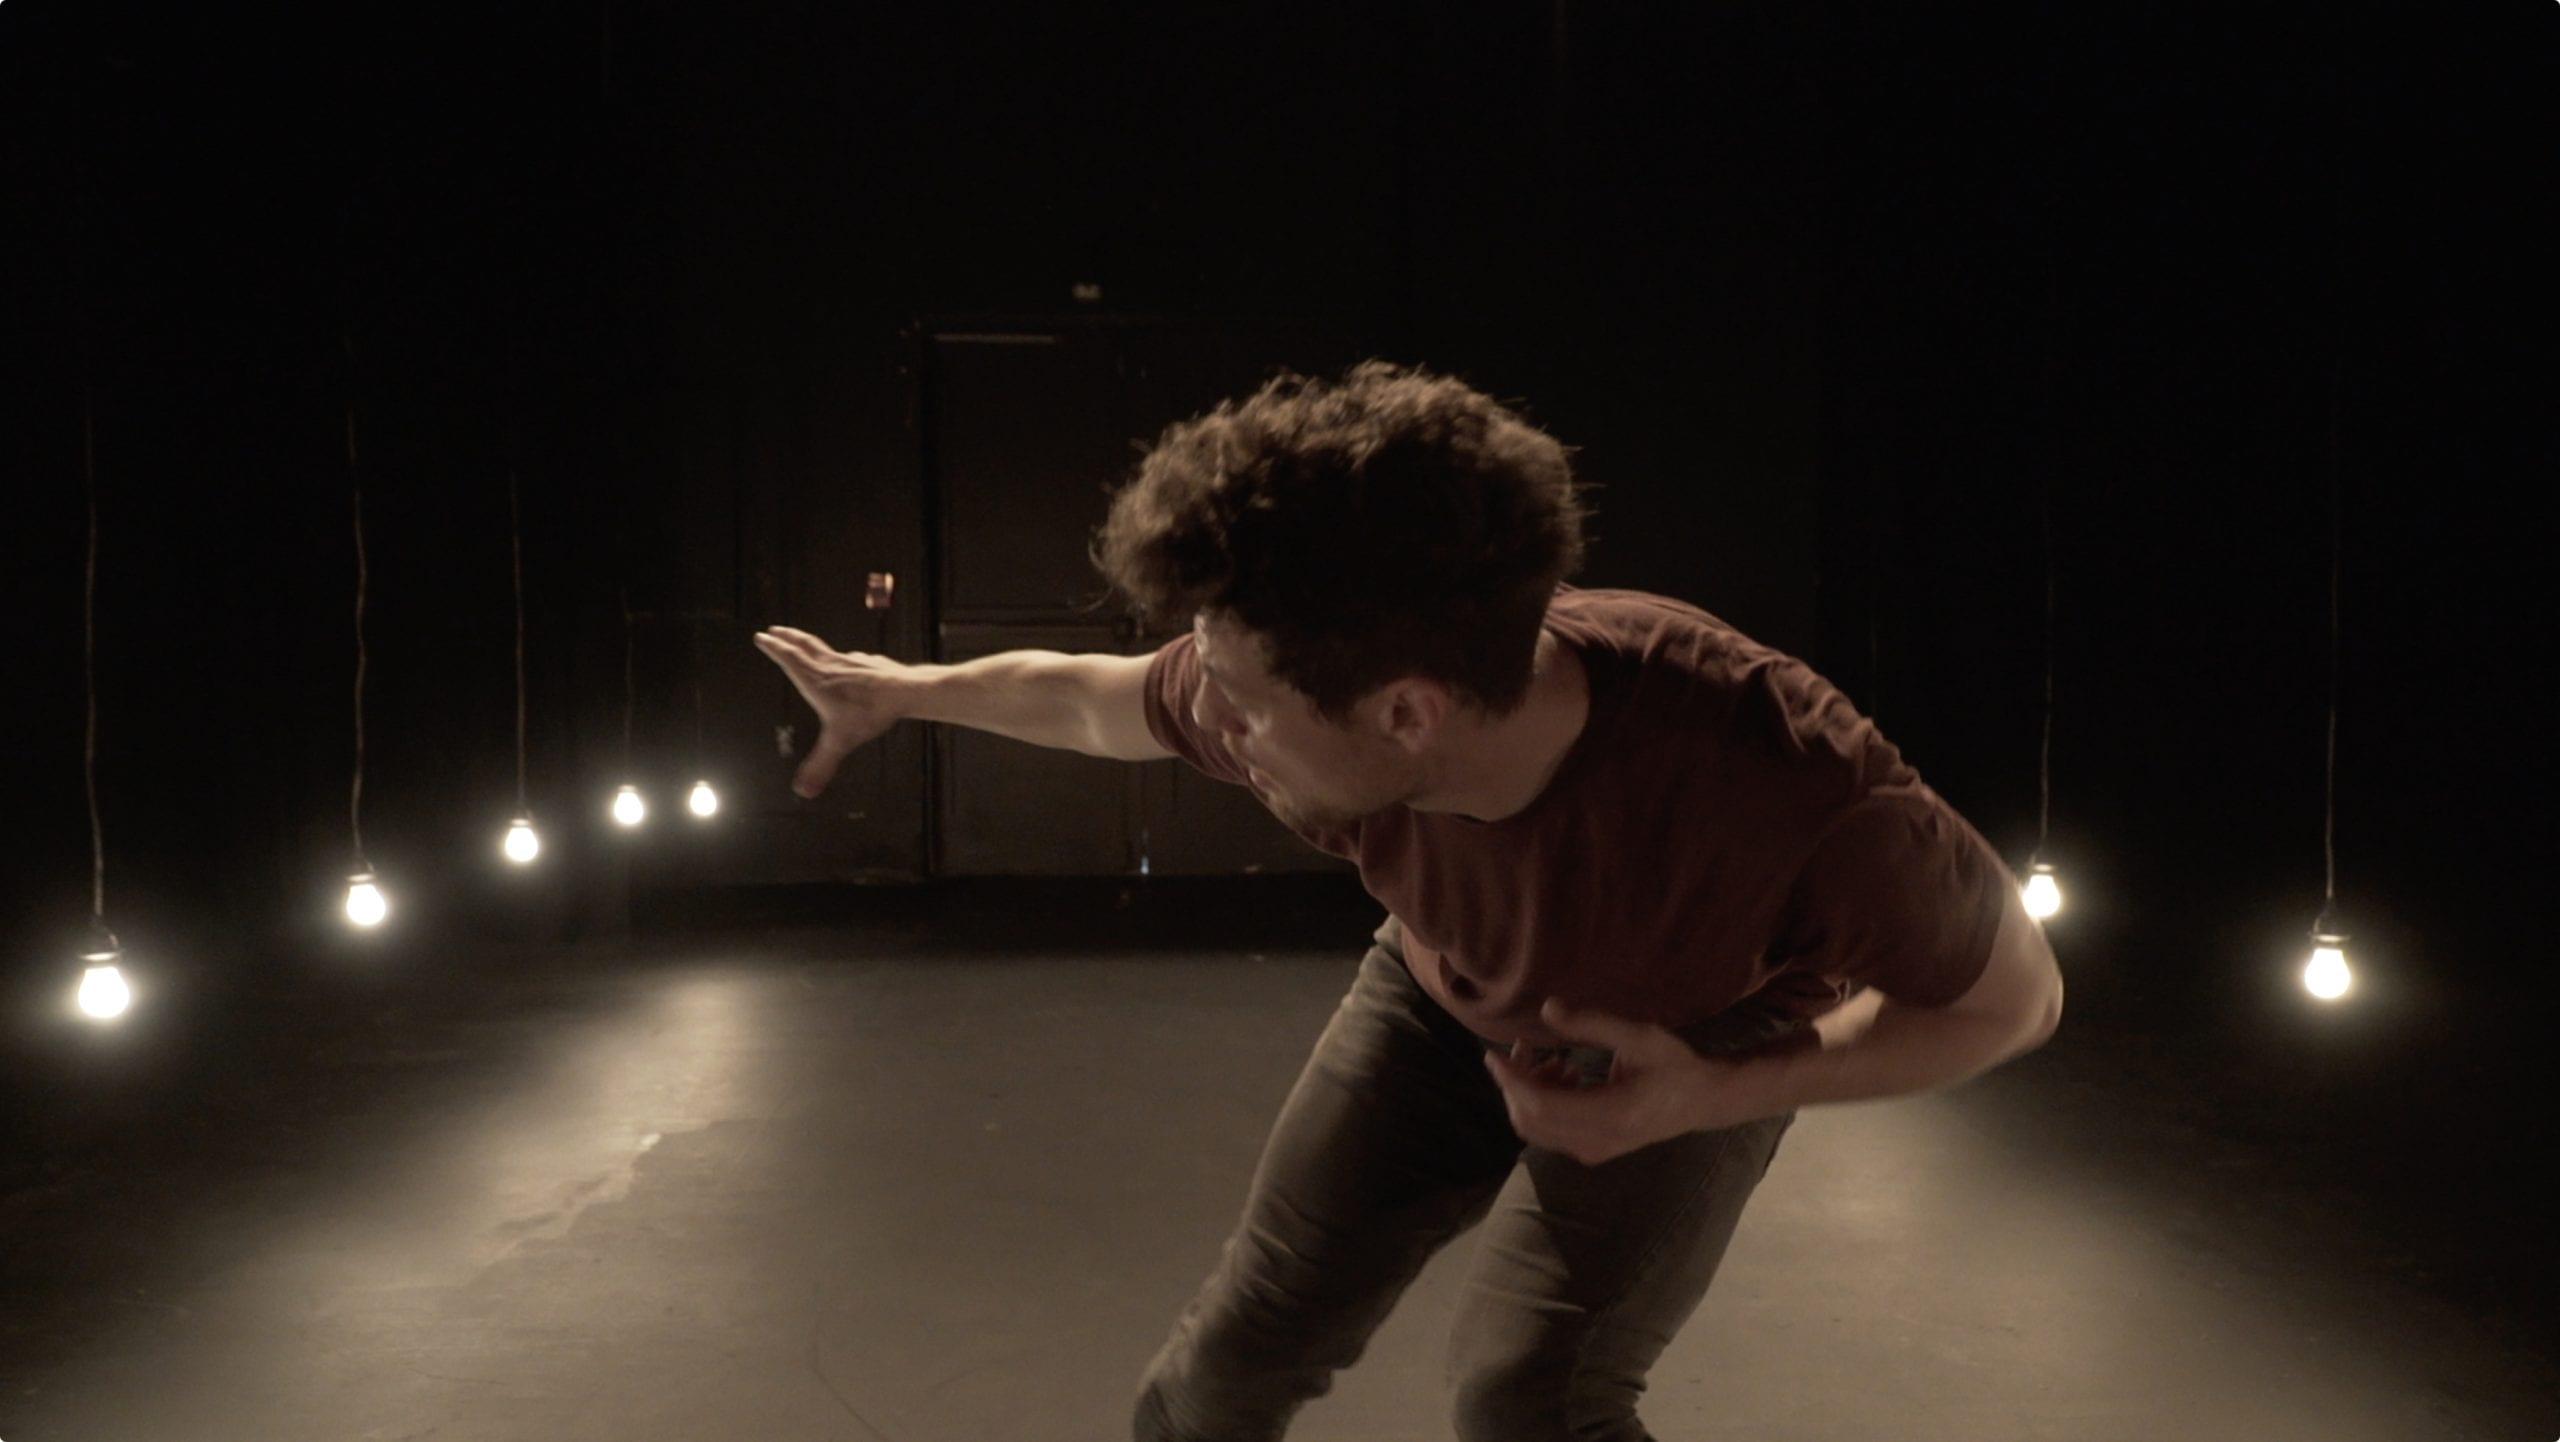 Screenshot of Josh Martin from Company 605 leaning forward, mid performance